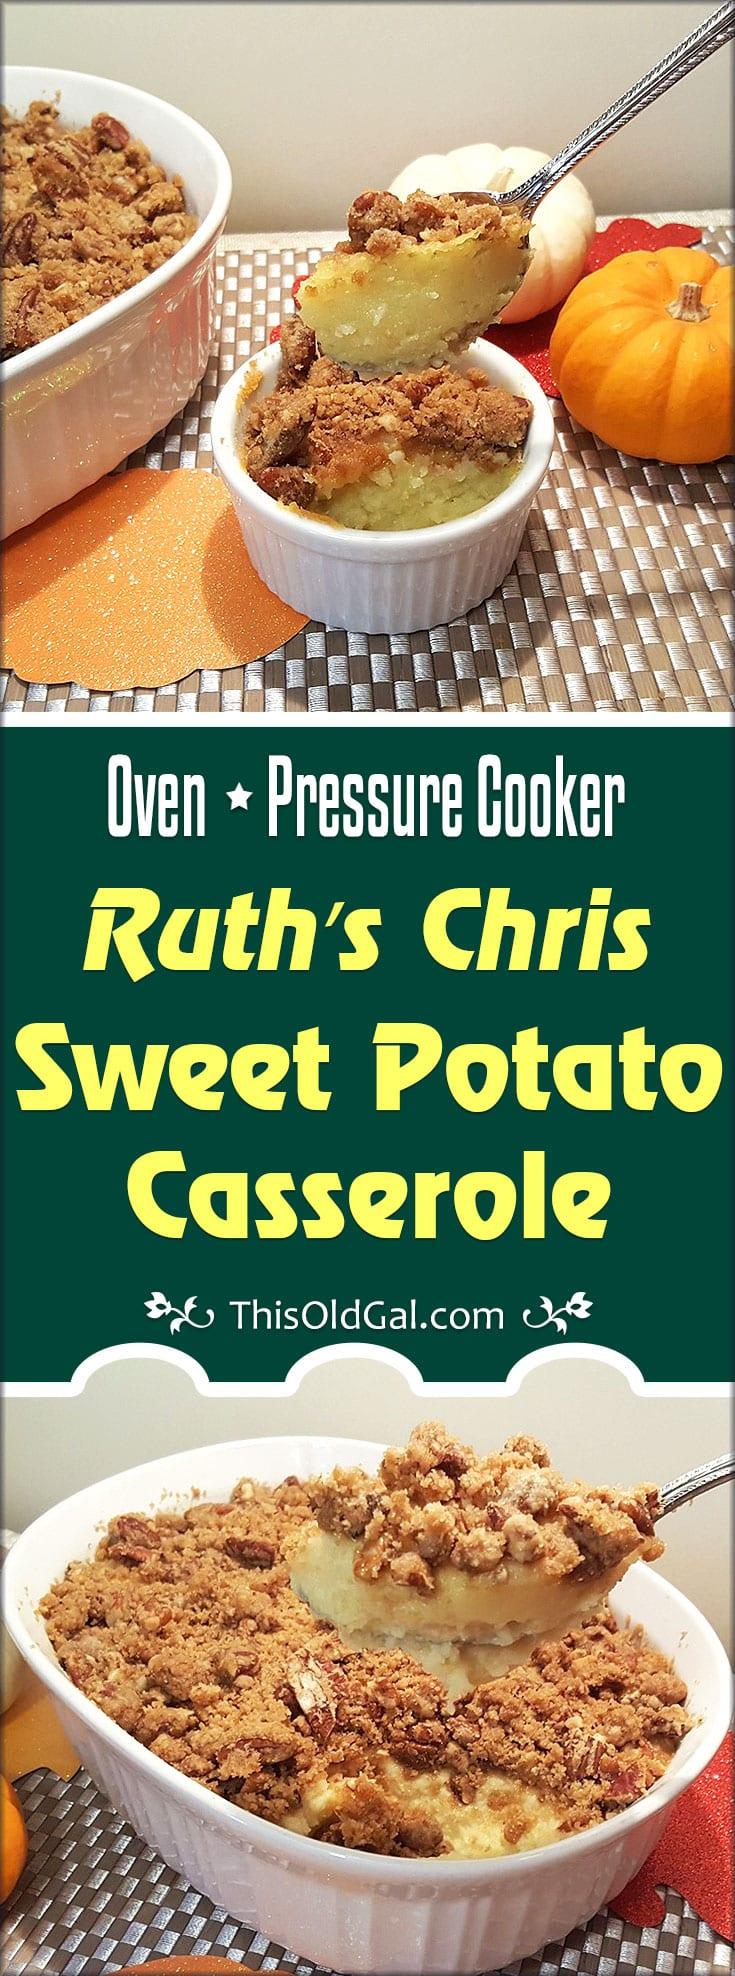 Ruth's Chris Sweet Potato Casserole (Pressure Cooker & Oven Method)